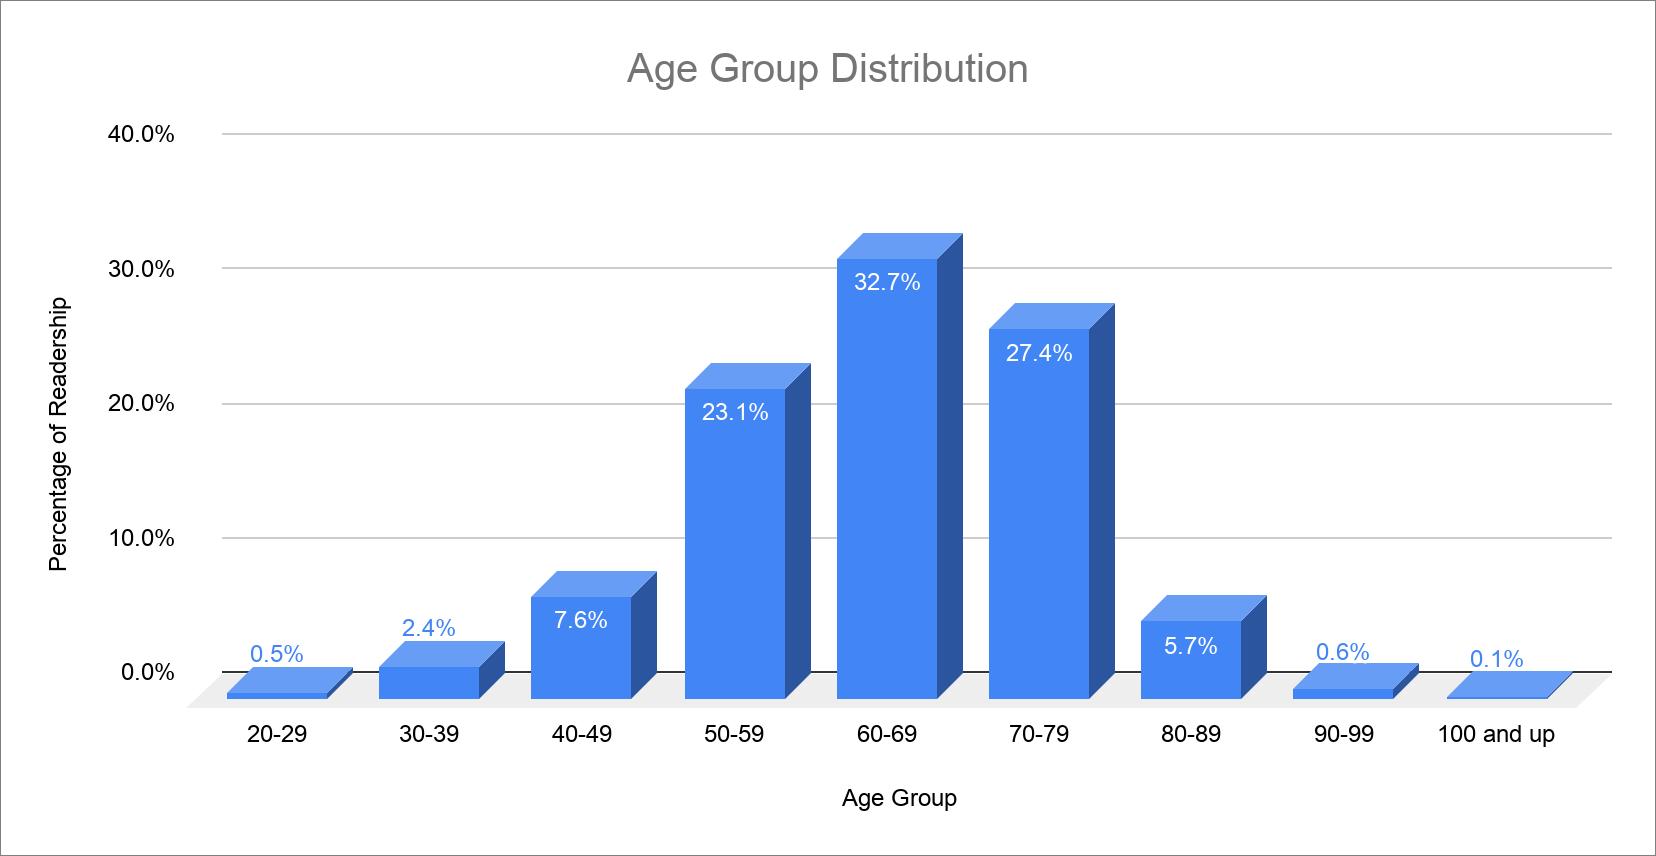 TidBITS 2019 Reader Survey Results - TidBITS